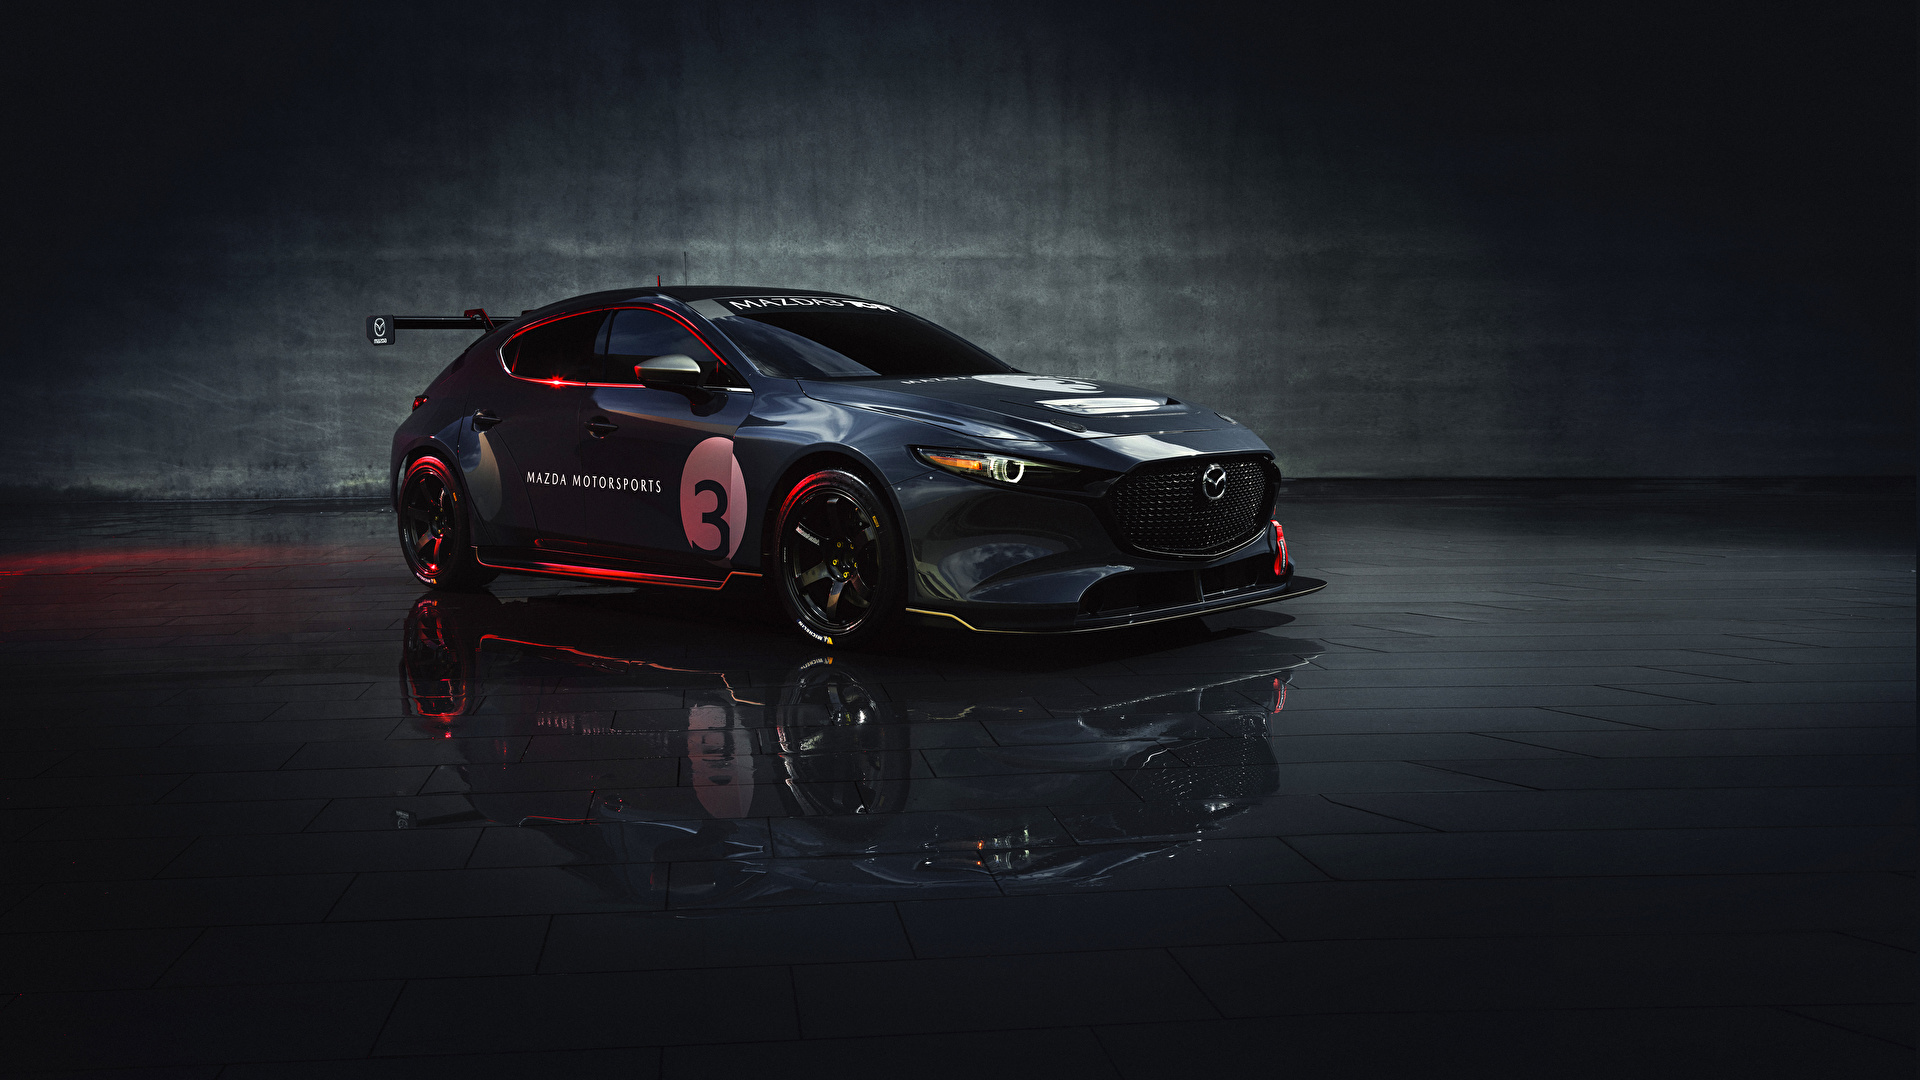 Picture Mazda Tuning 2020 Mazda3 Tcr Gray Cars Metallic 1920x1080